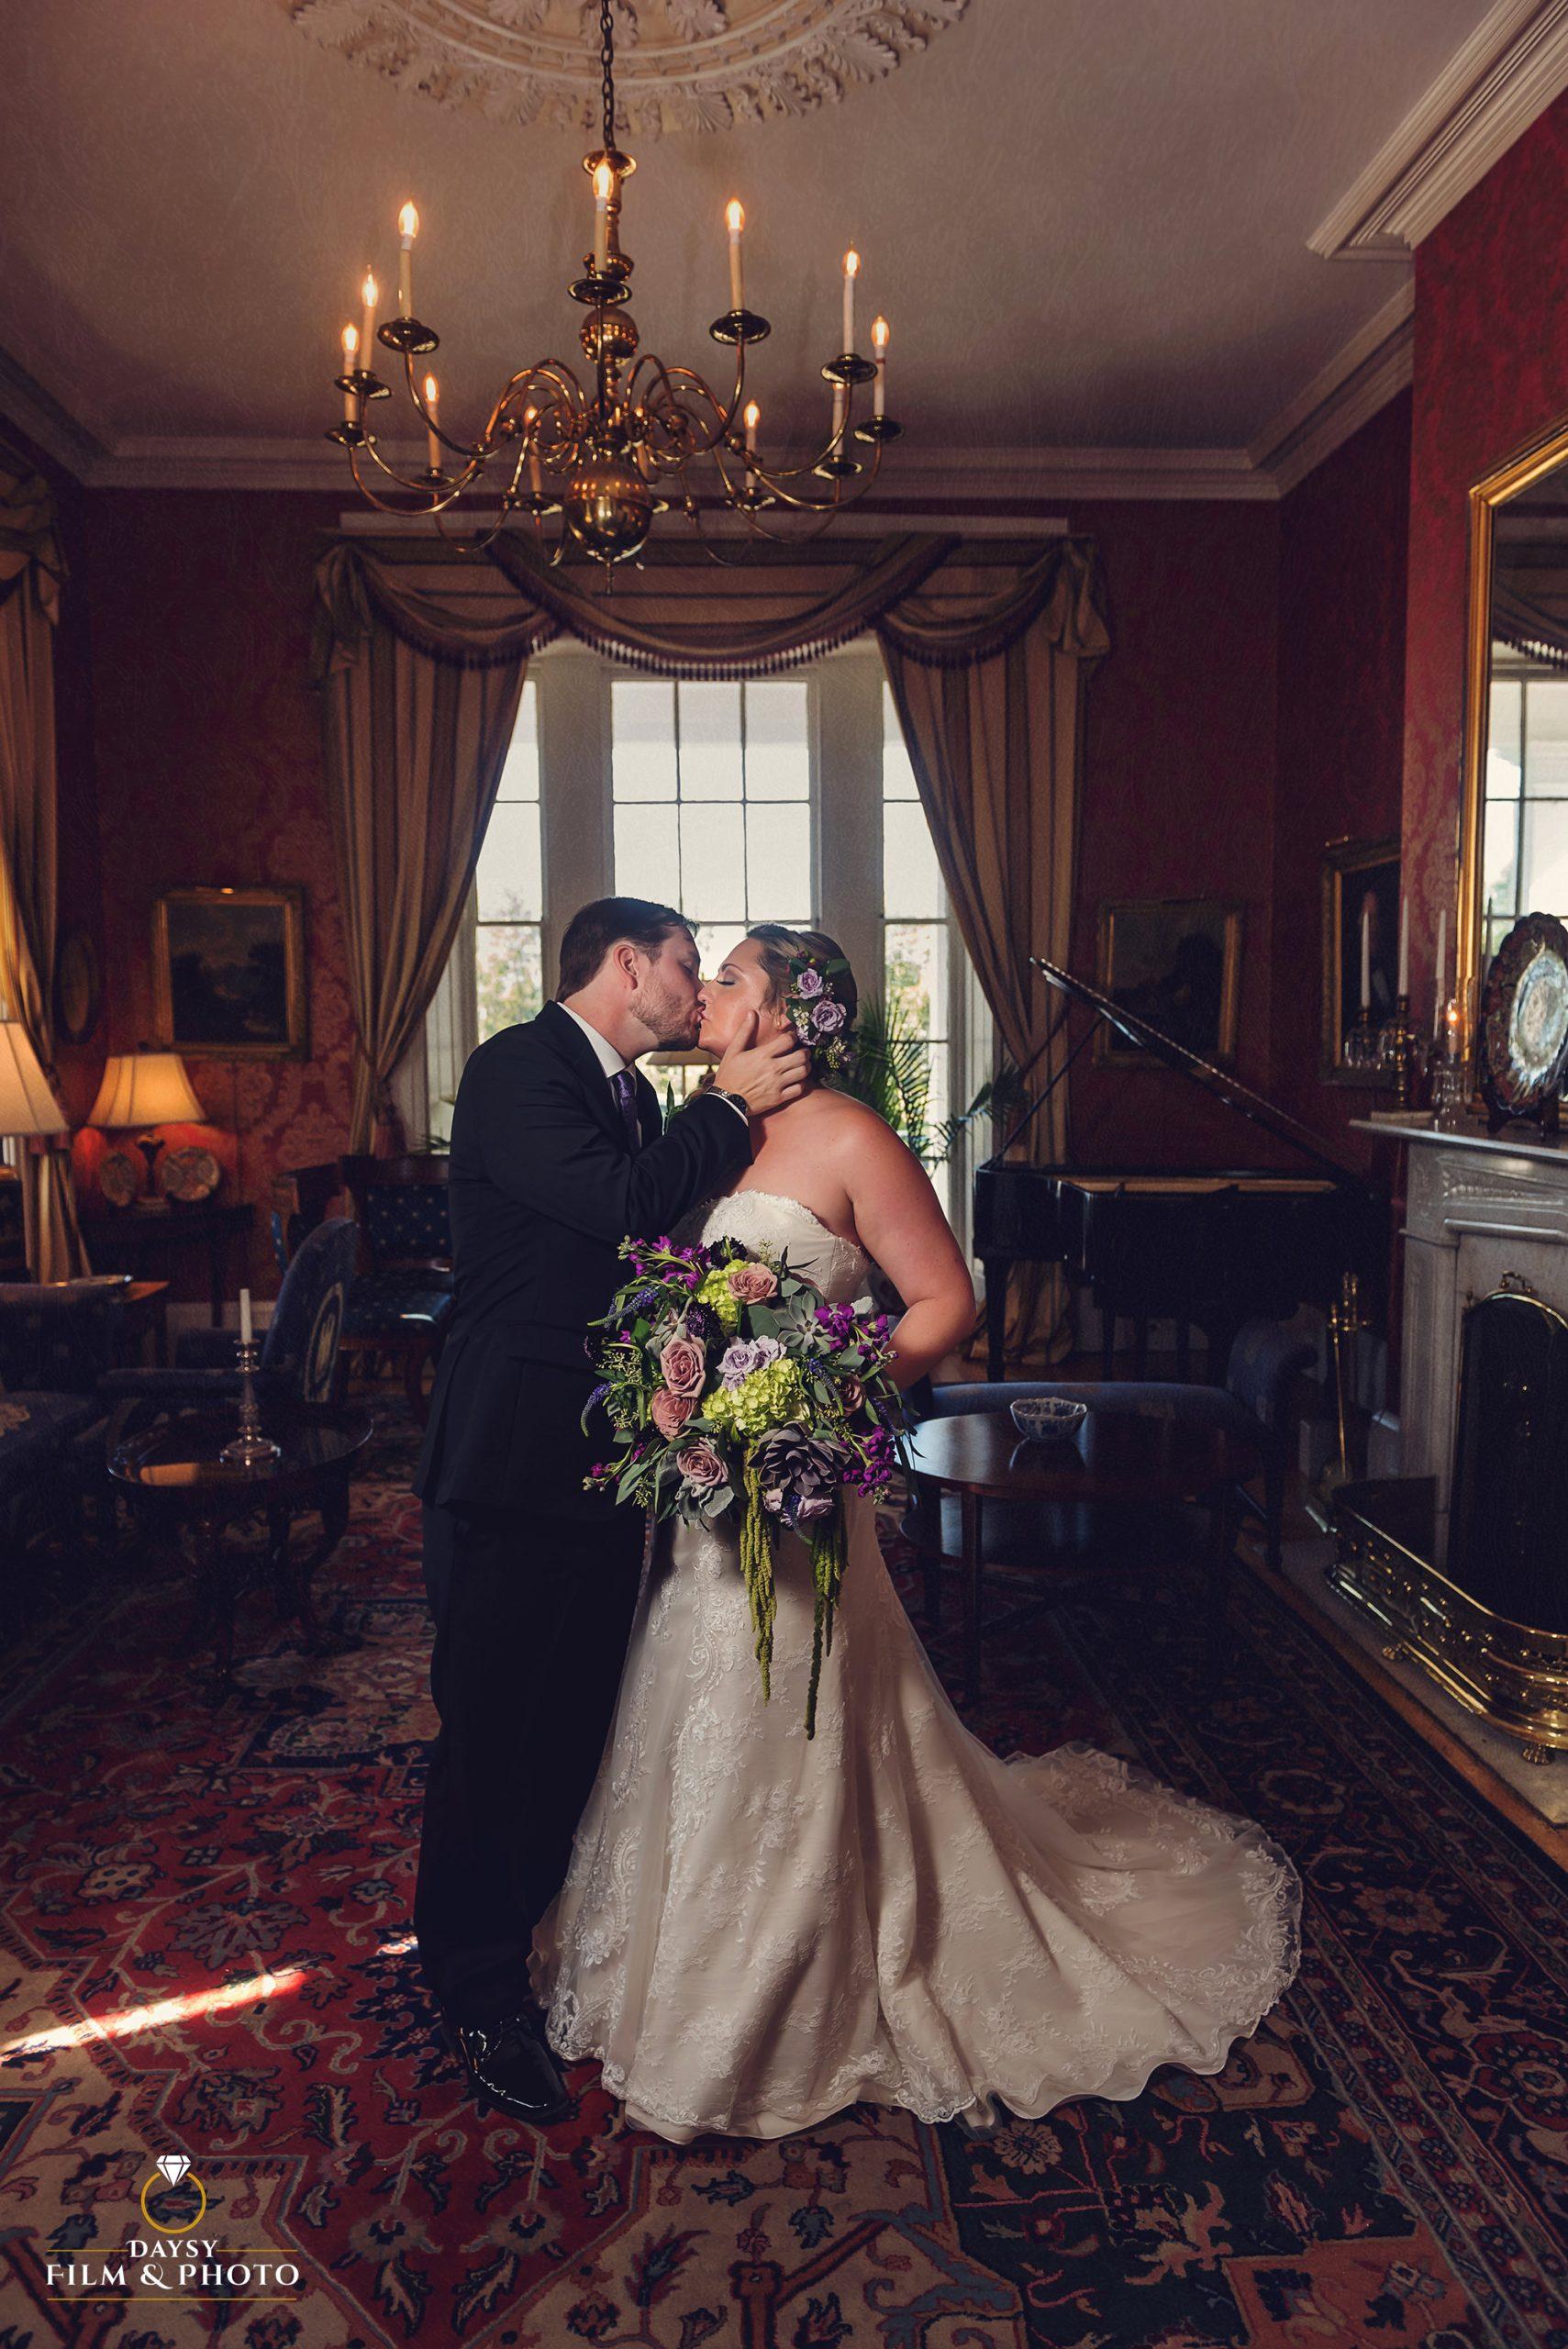 Antrim 1844 Inn wedding photos couple indoor